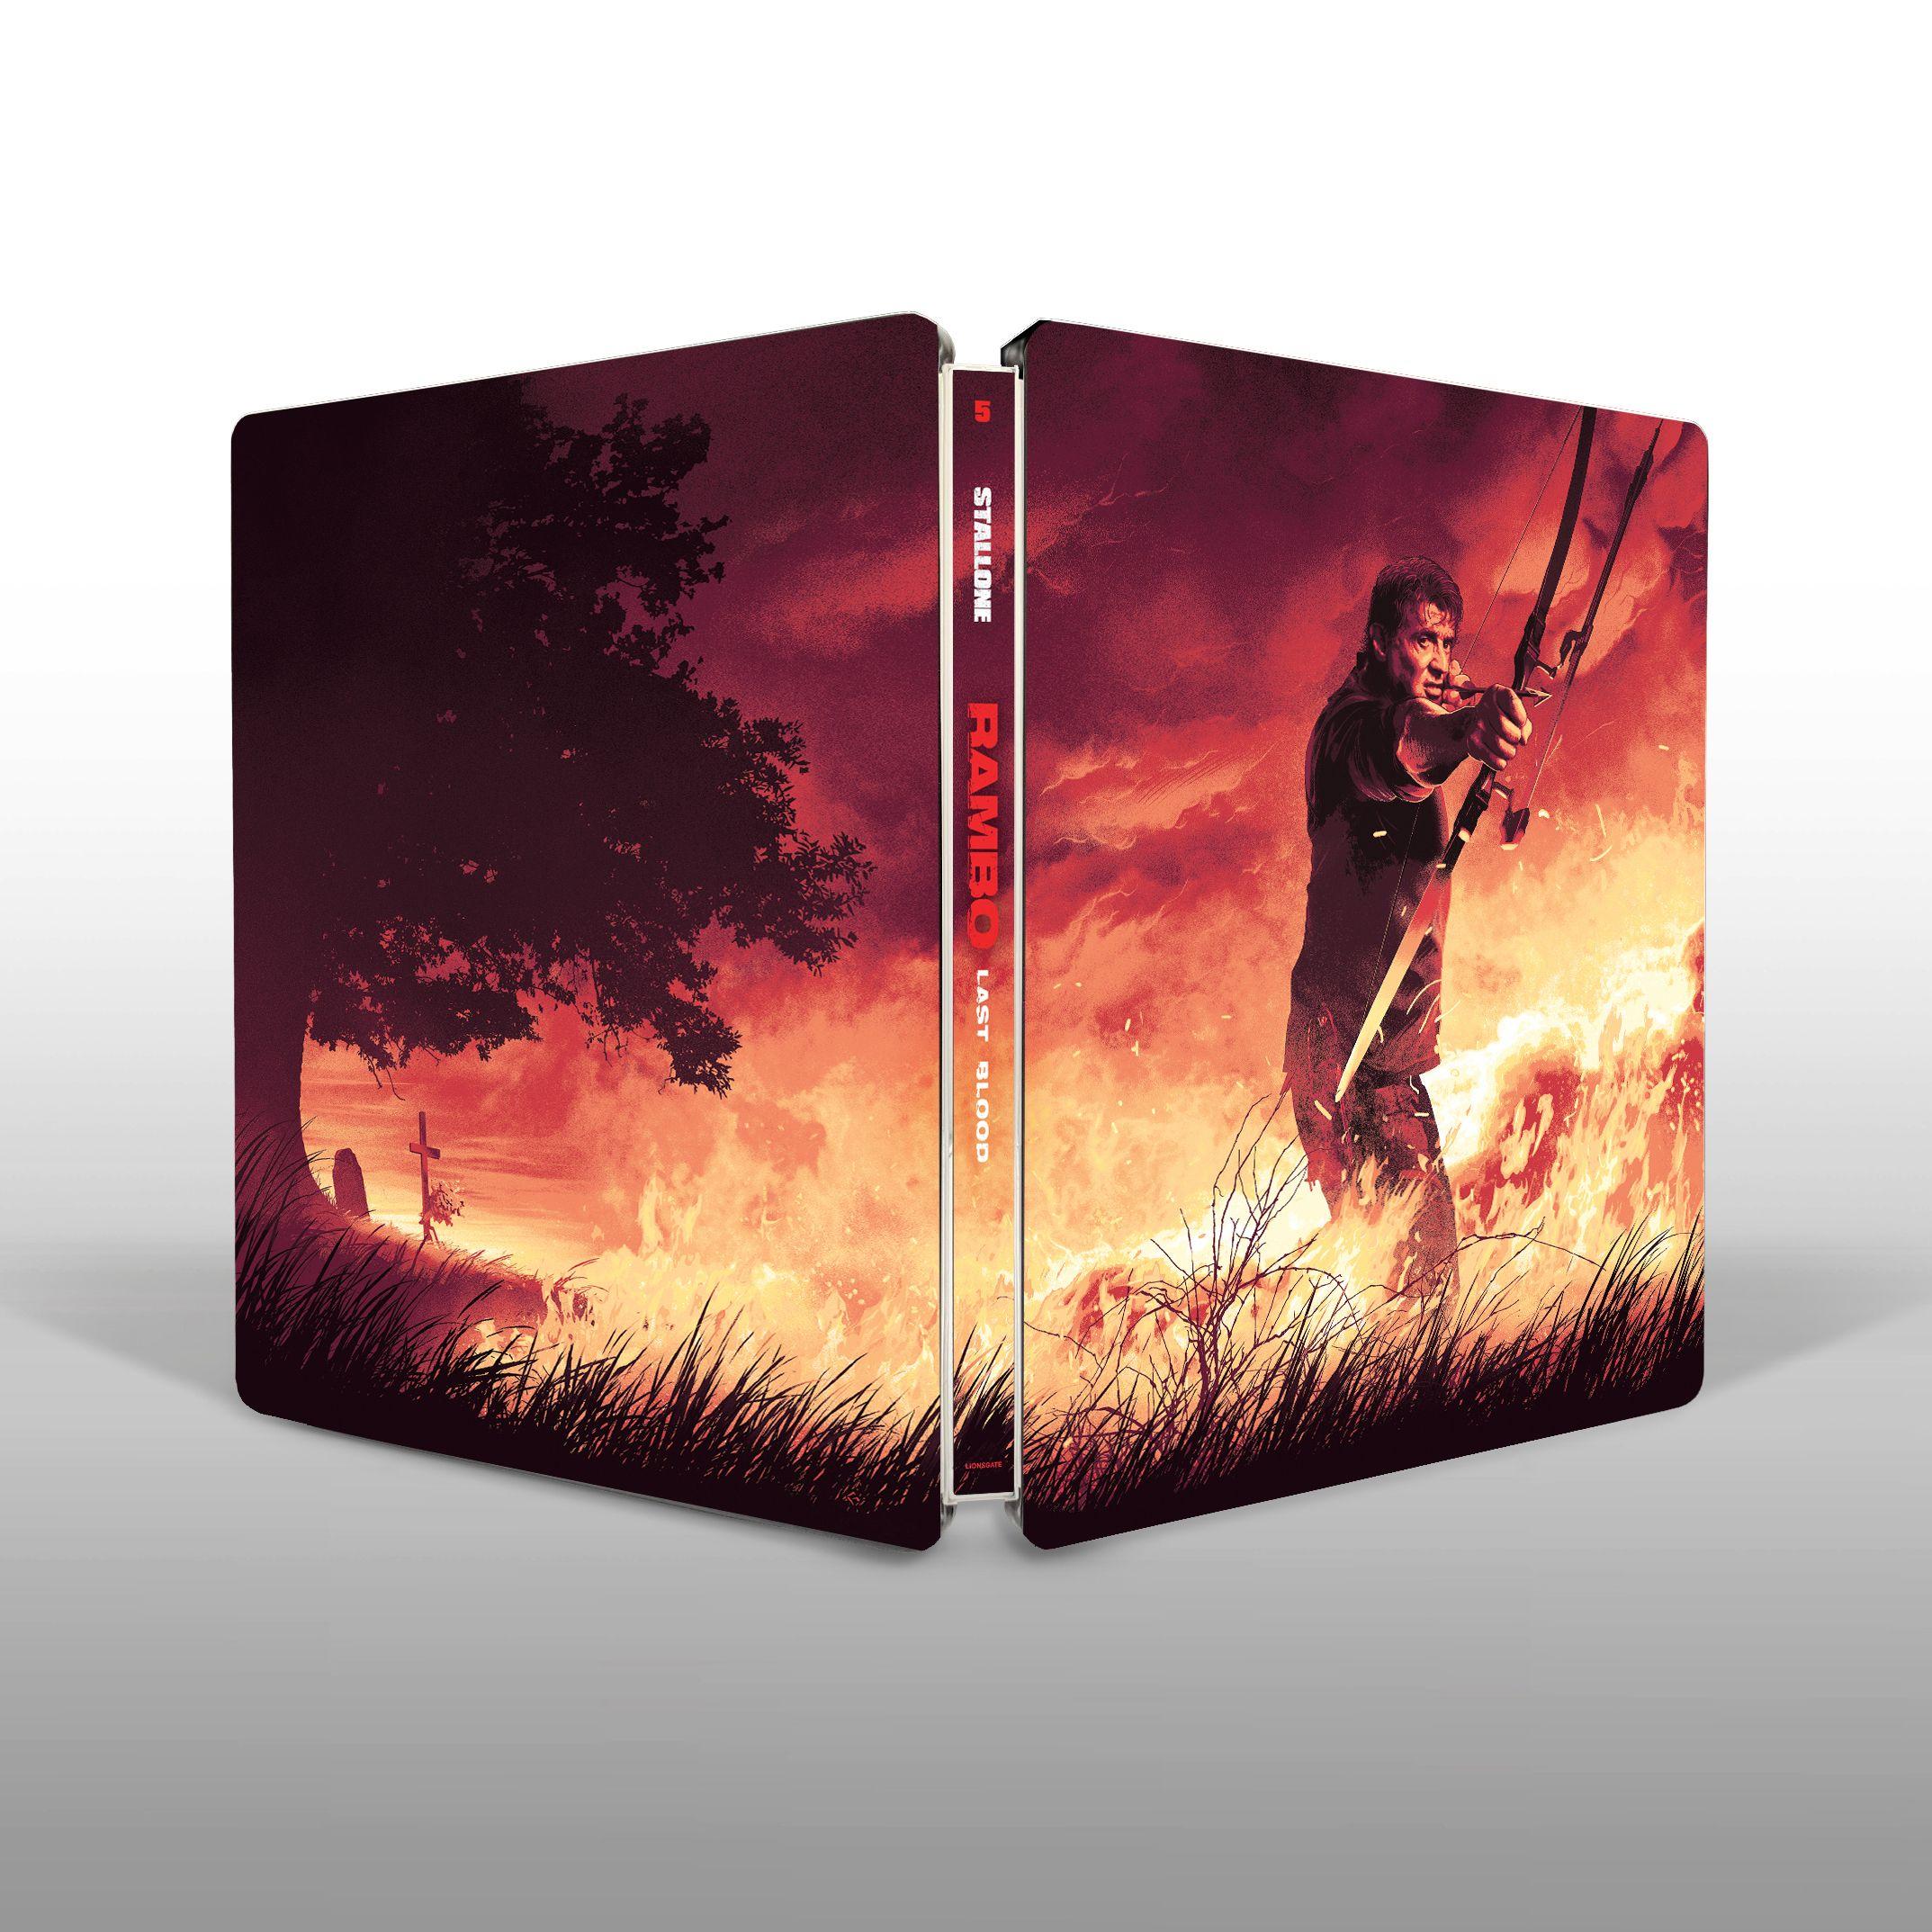 rambo-last-blood-steelbook.jpg